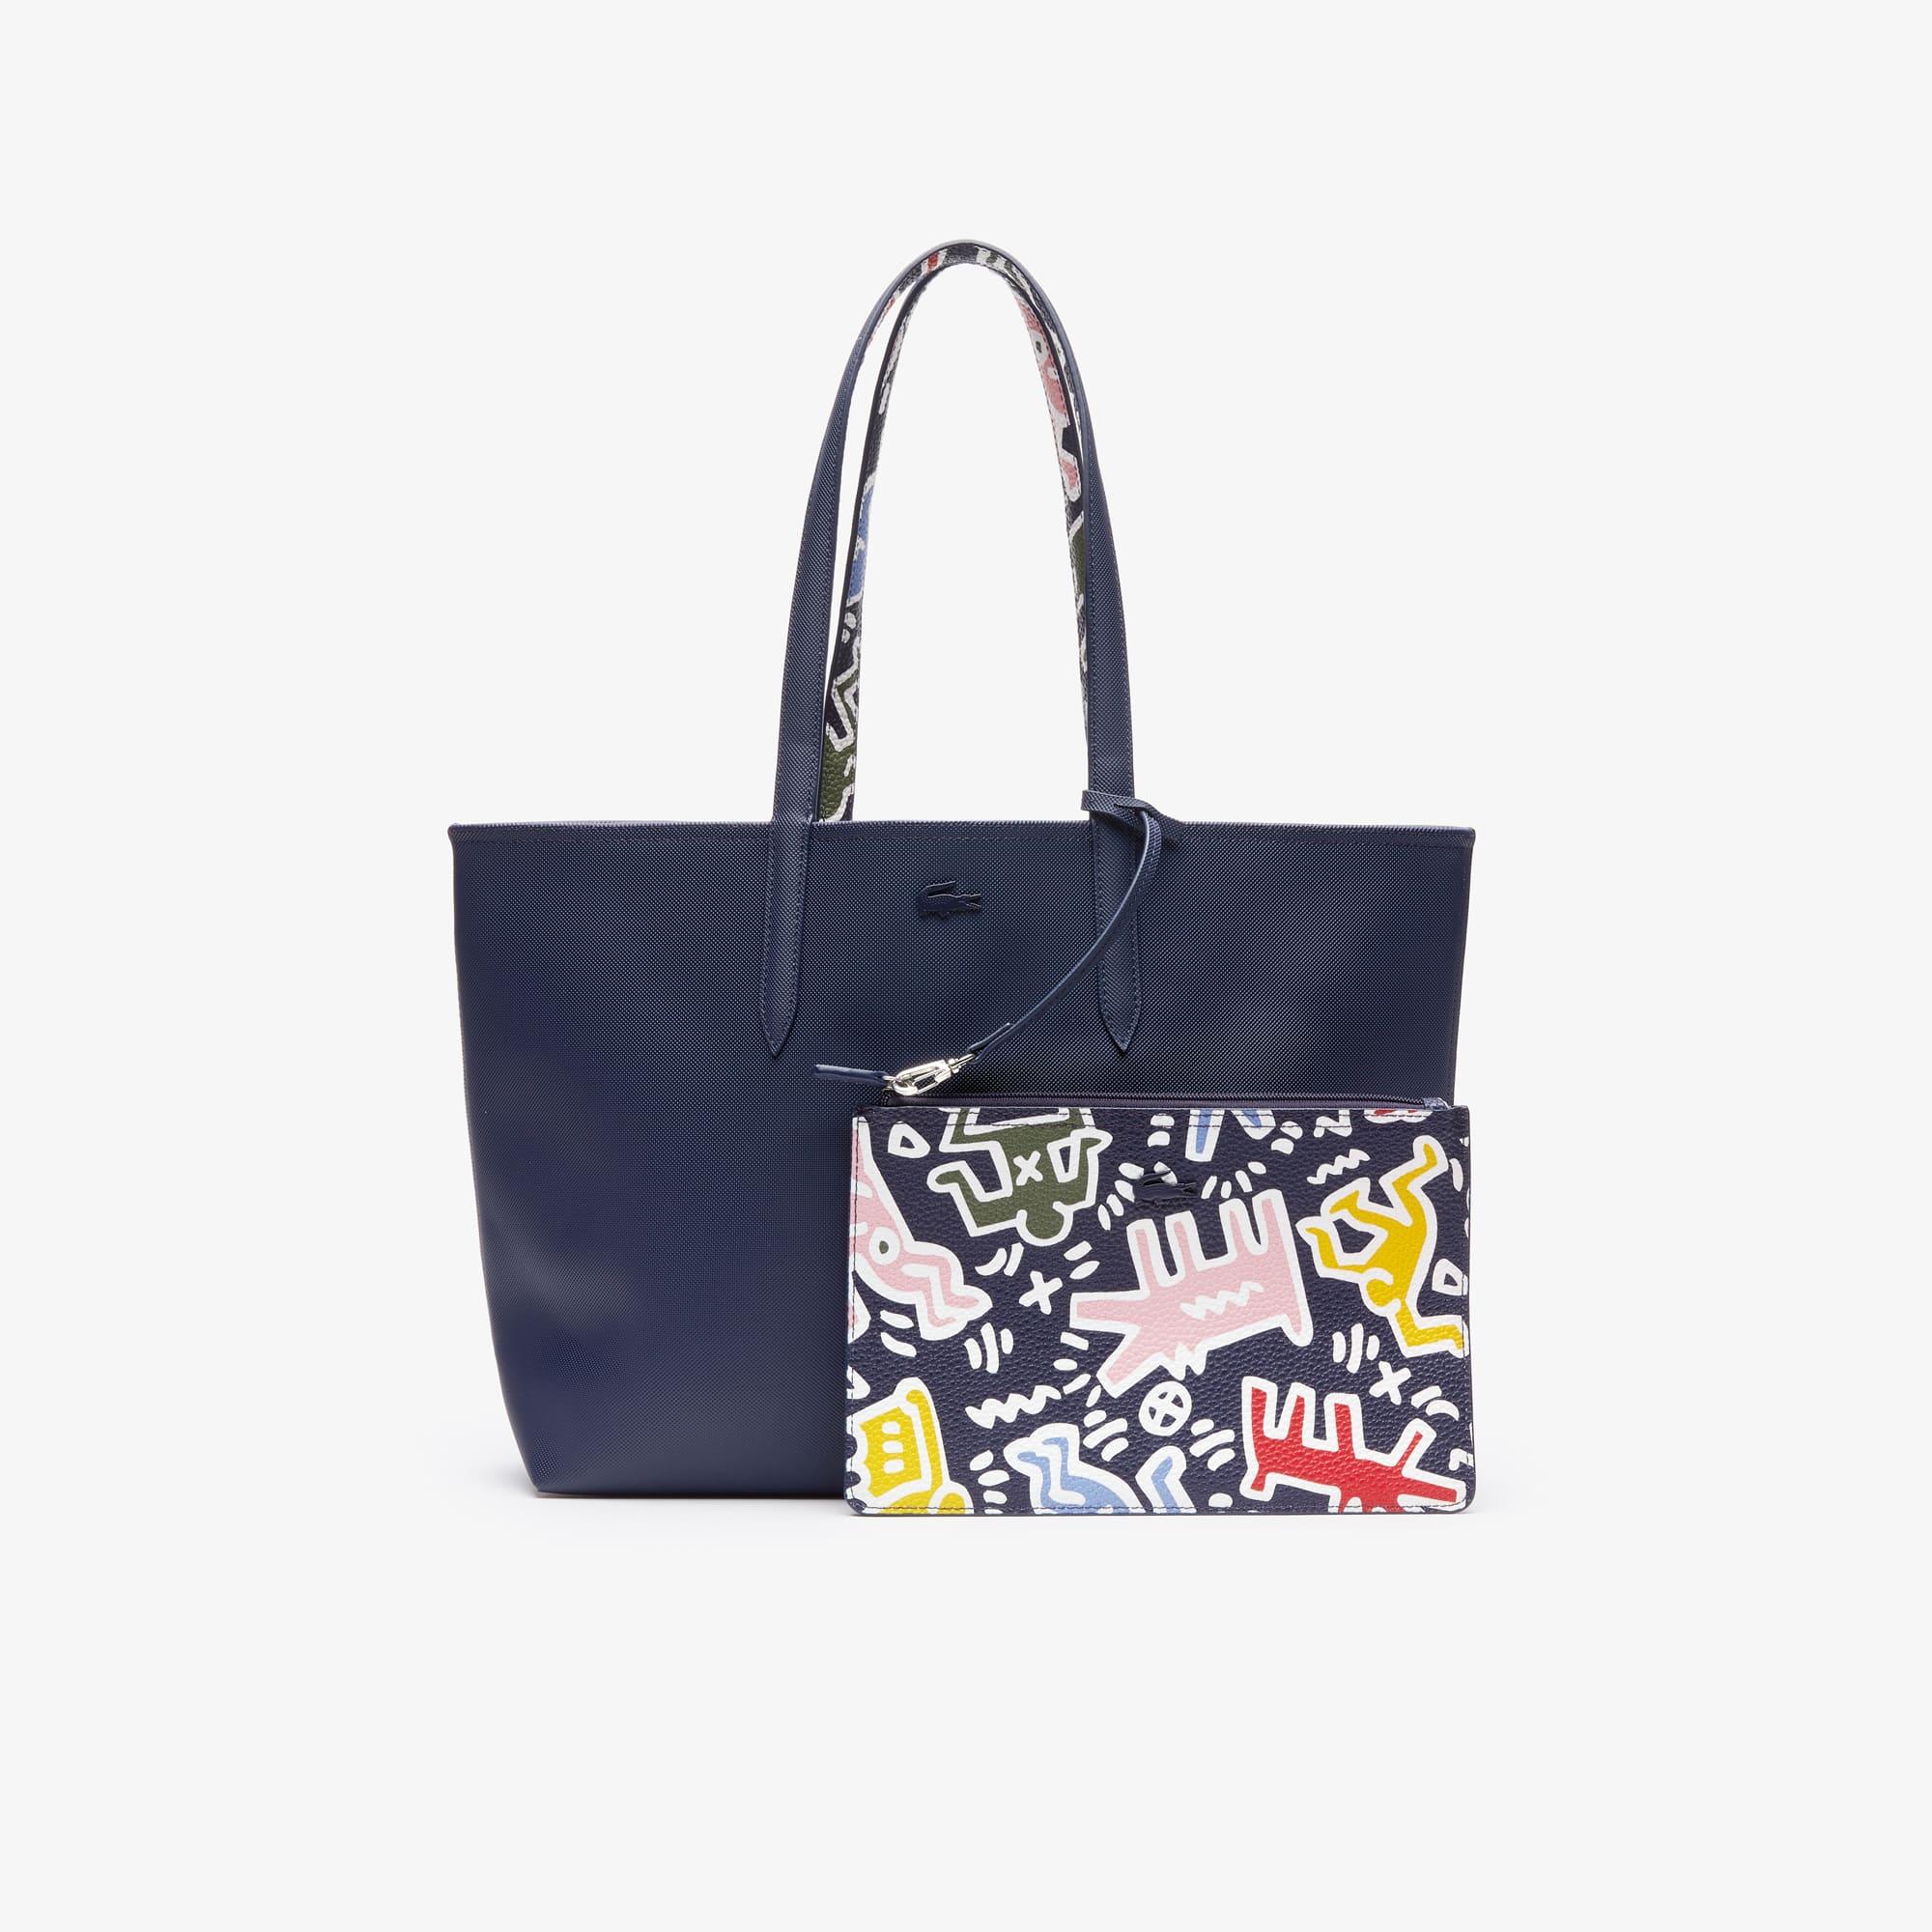 3ca04cdaf4a5d Damen ANNA Tote Bag mit Keith Haring Design